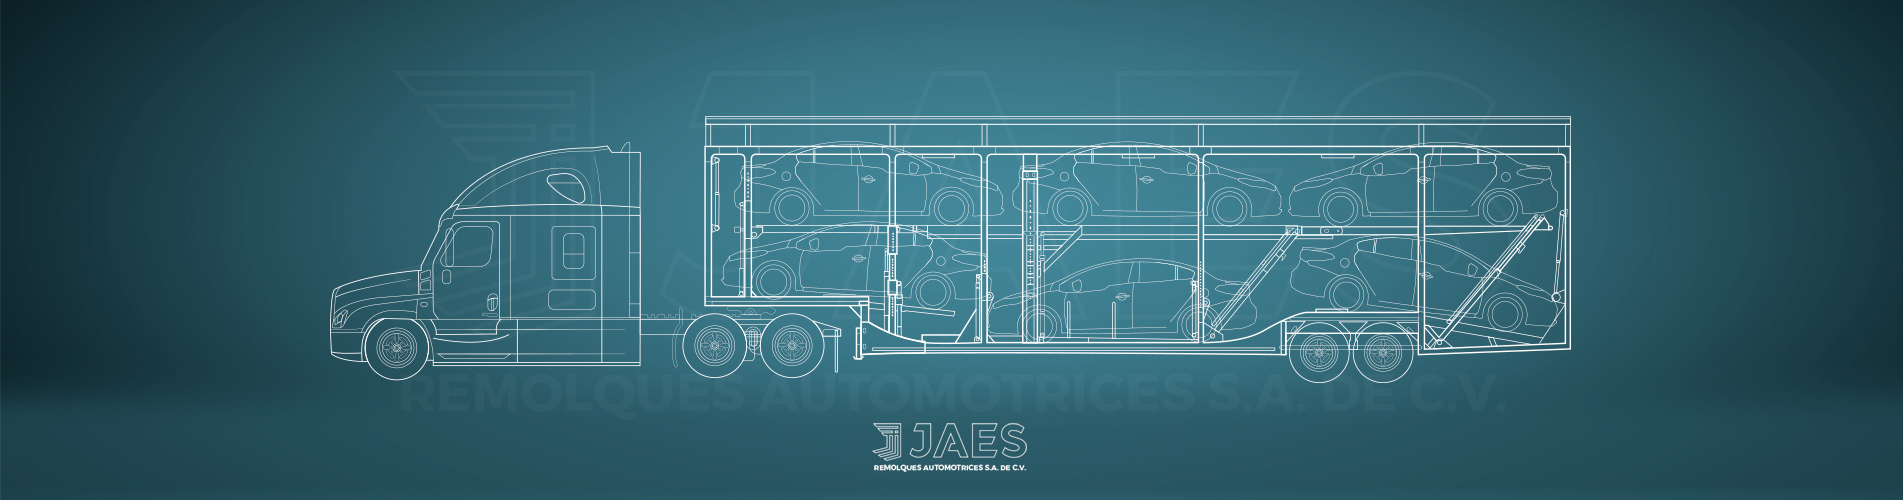 BluePrint-WebJAES-53pies1